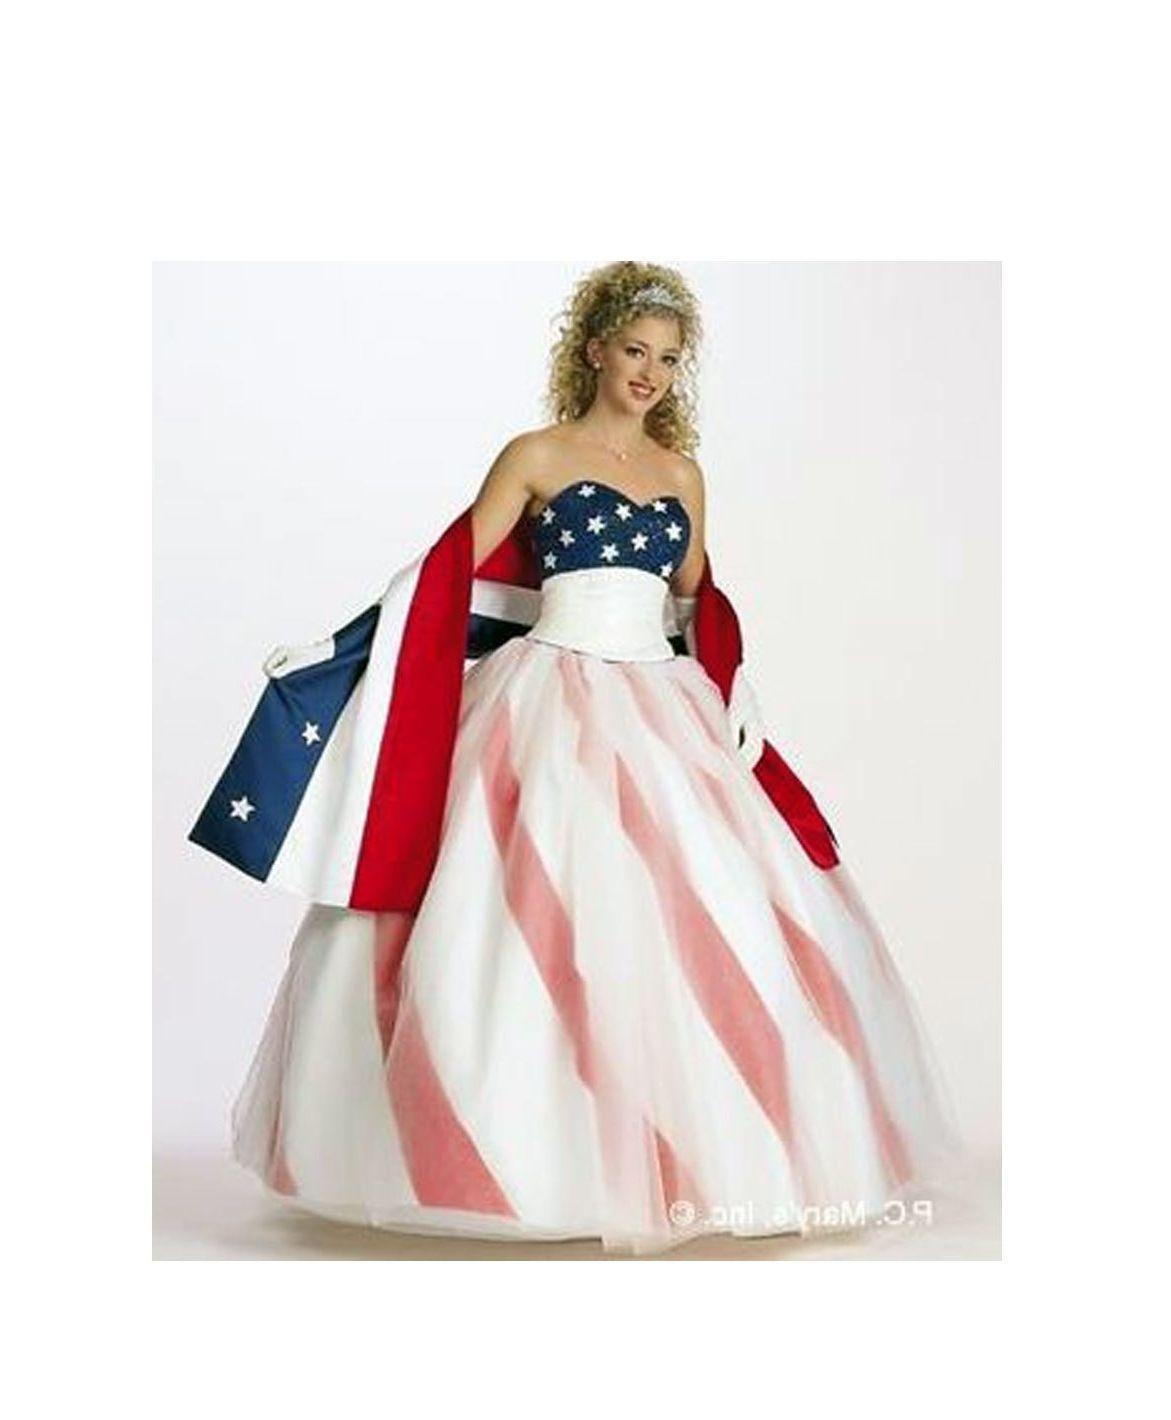 American Flag Wedding Gown | Wedding Dress | Pinterest | Gowns ...